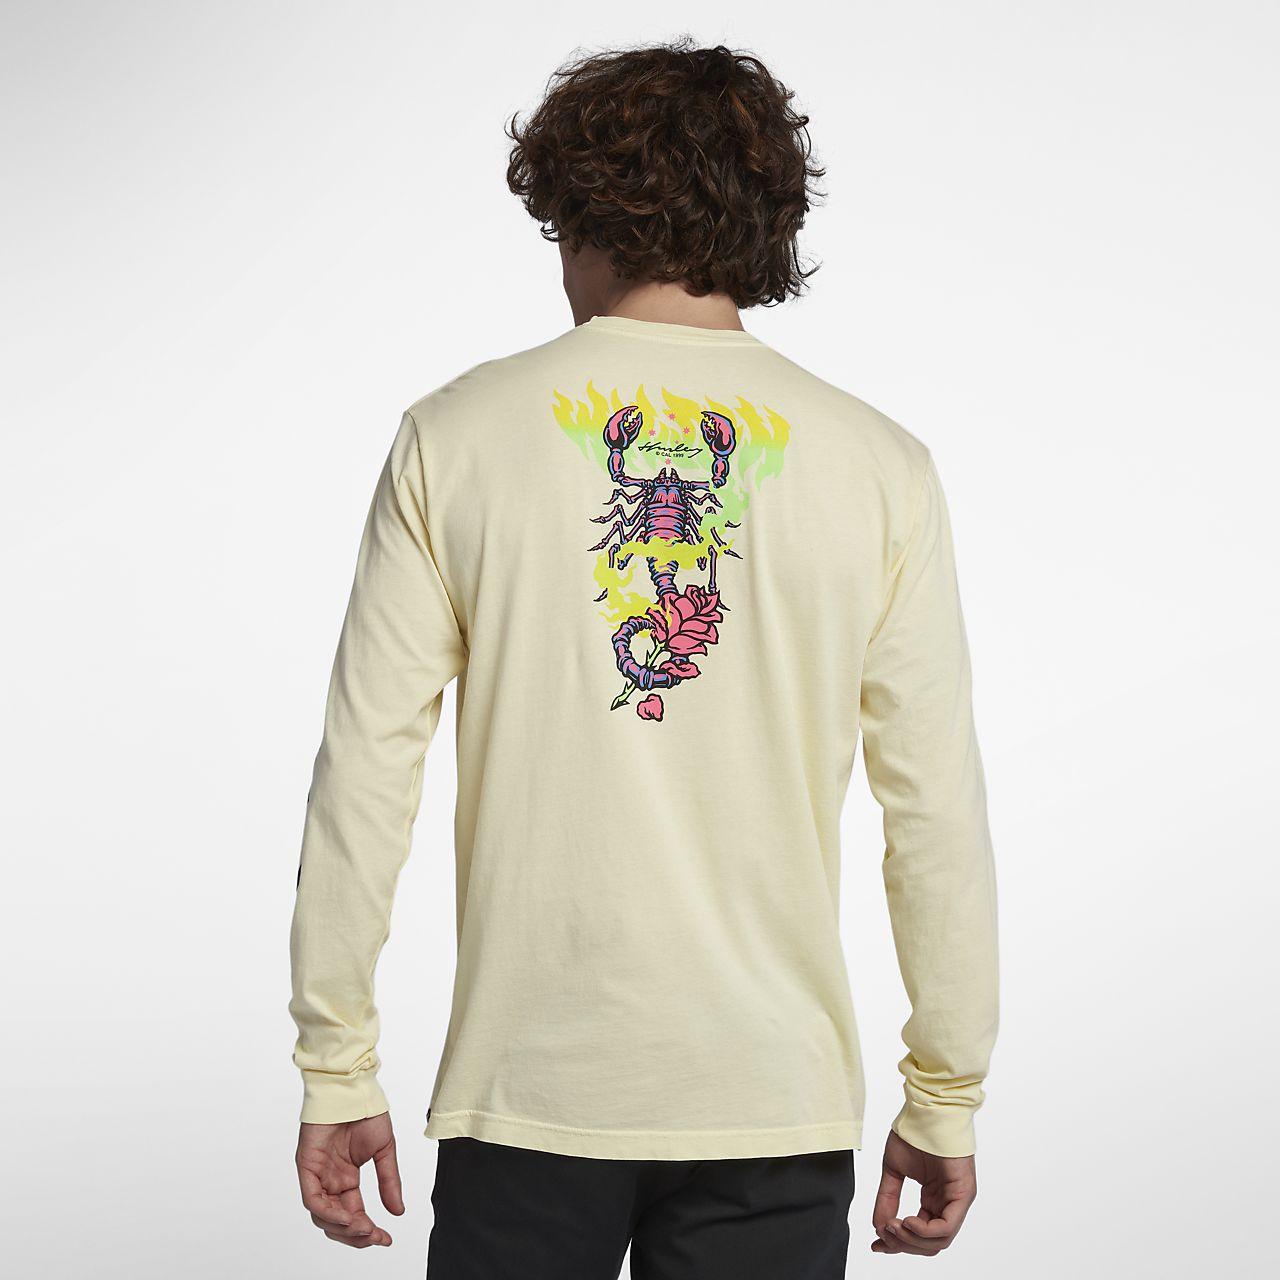 Hurley Team Wilson Langarm-T-Shirt für Herren